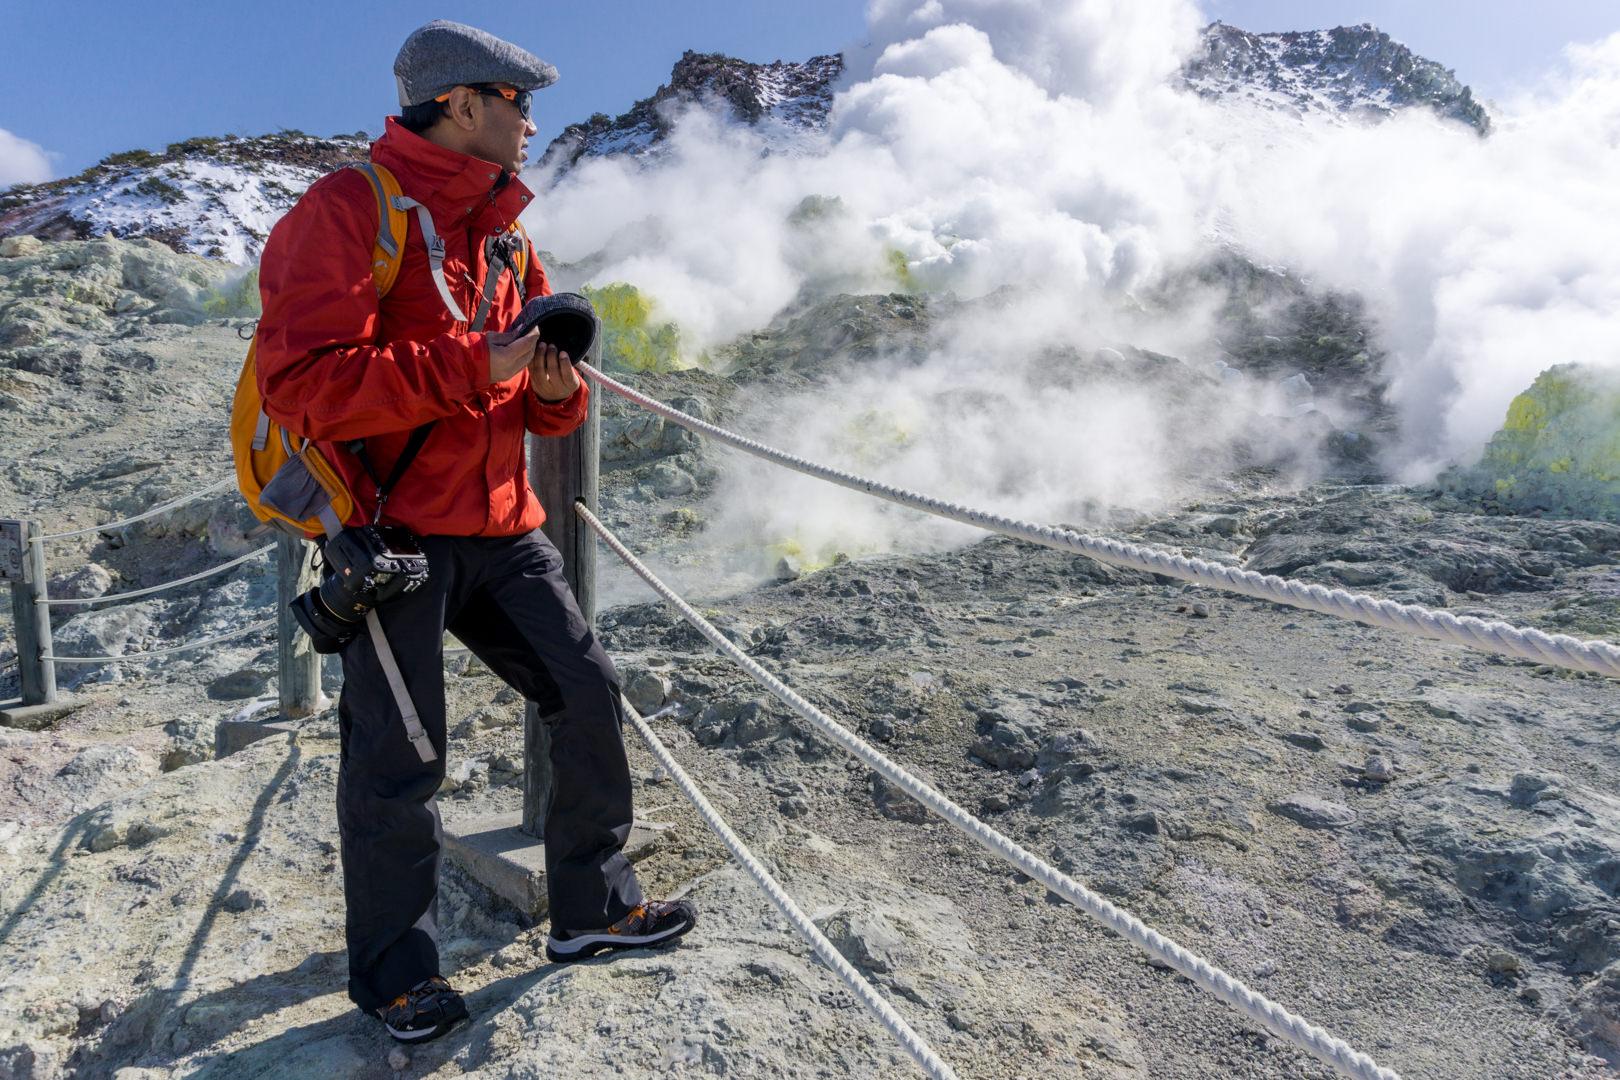 The fuming Sulphur vents on Iozan